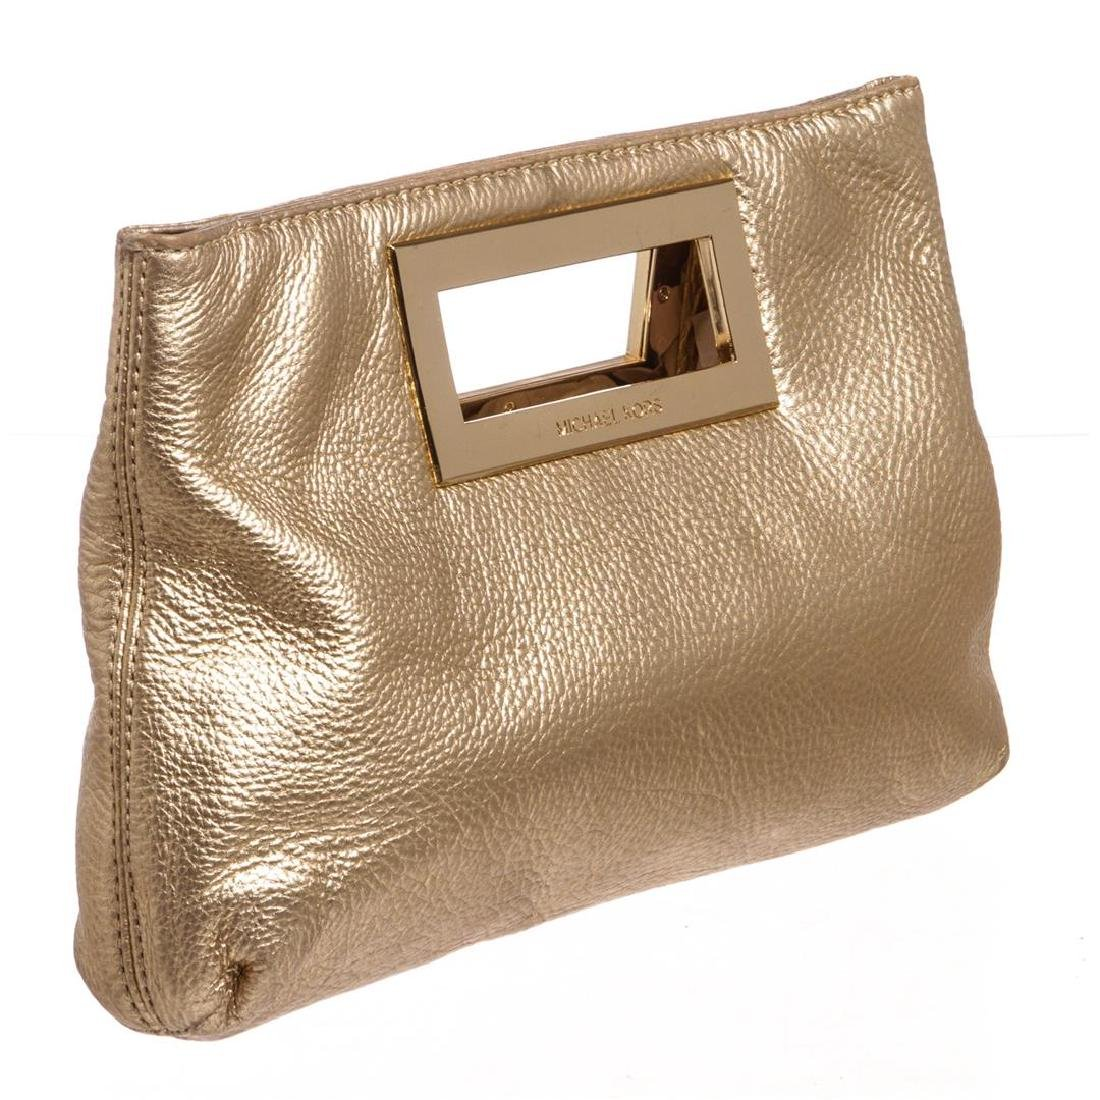 Michael Kors Pale Gold Leather Berkley Clutch Handbag - 3